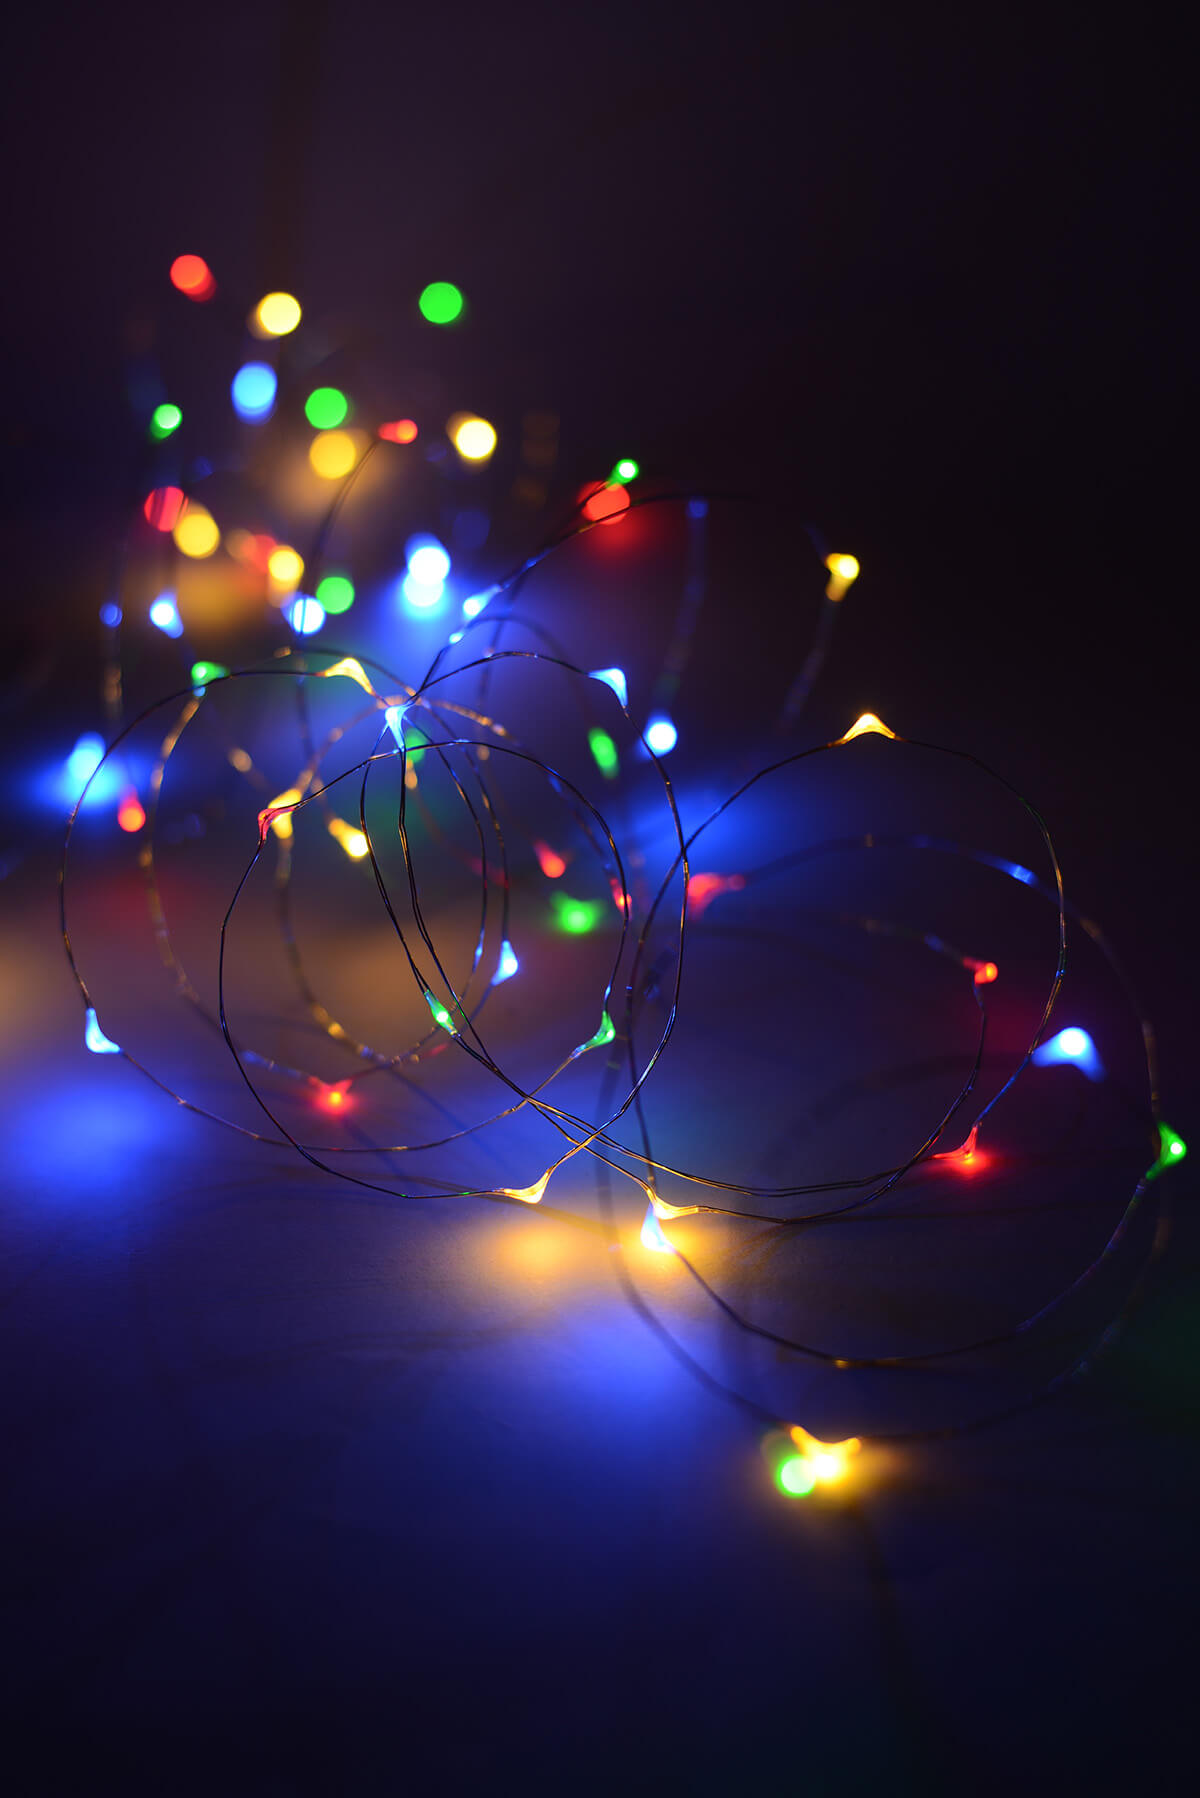 christmas light coldplay lyrics avh x2600bt wiring diagram christmaslights